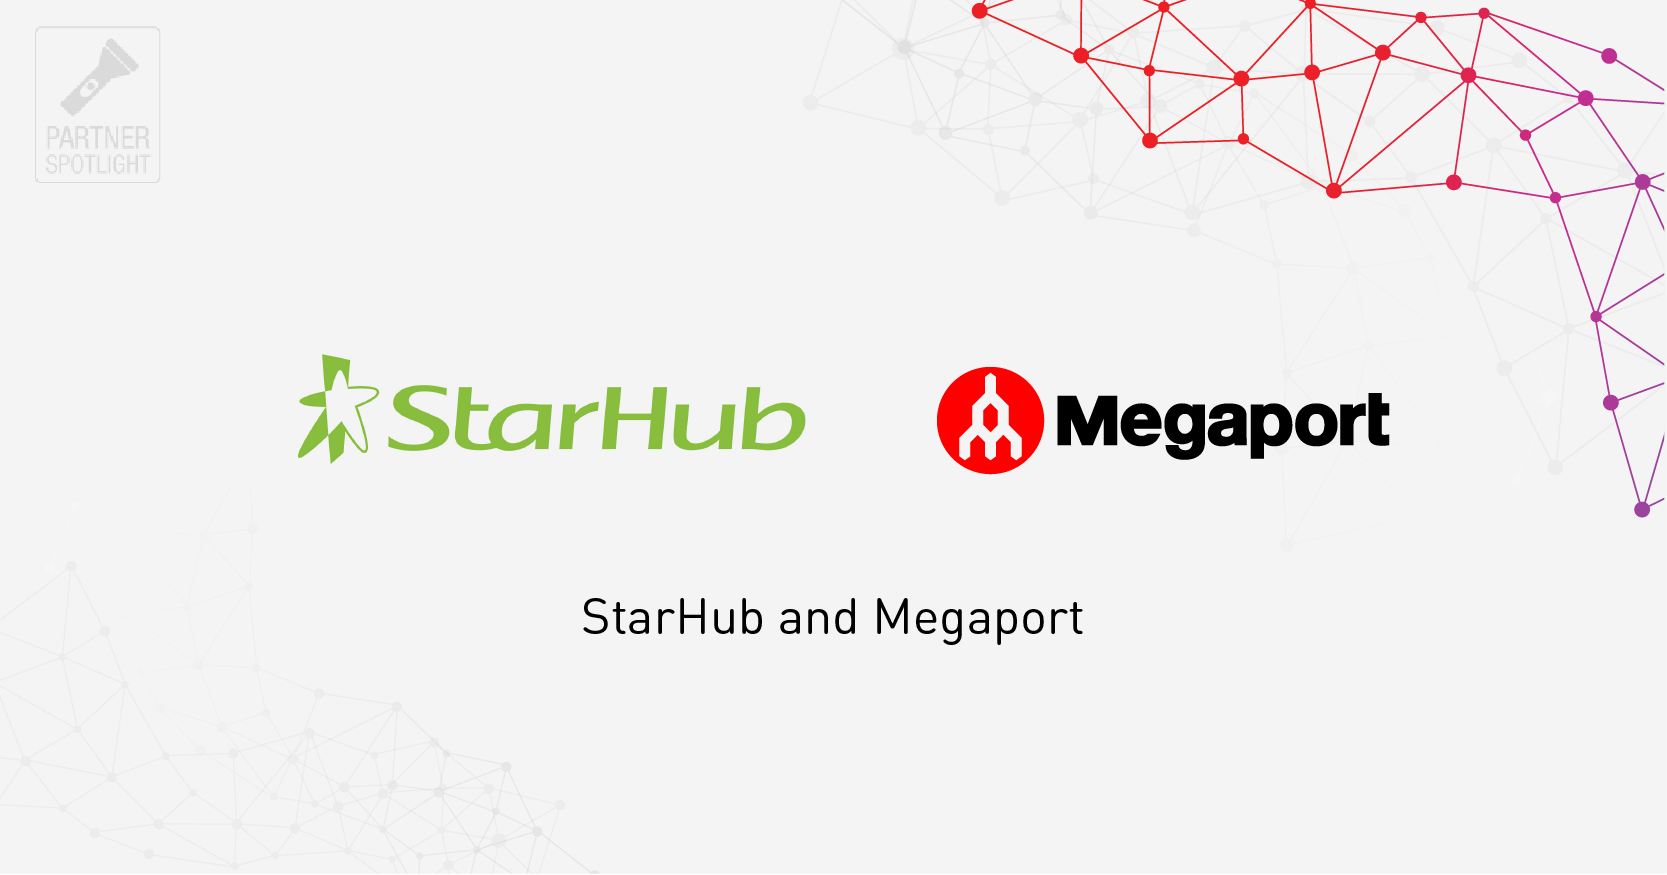 starhub and megaport